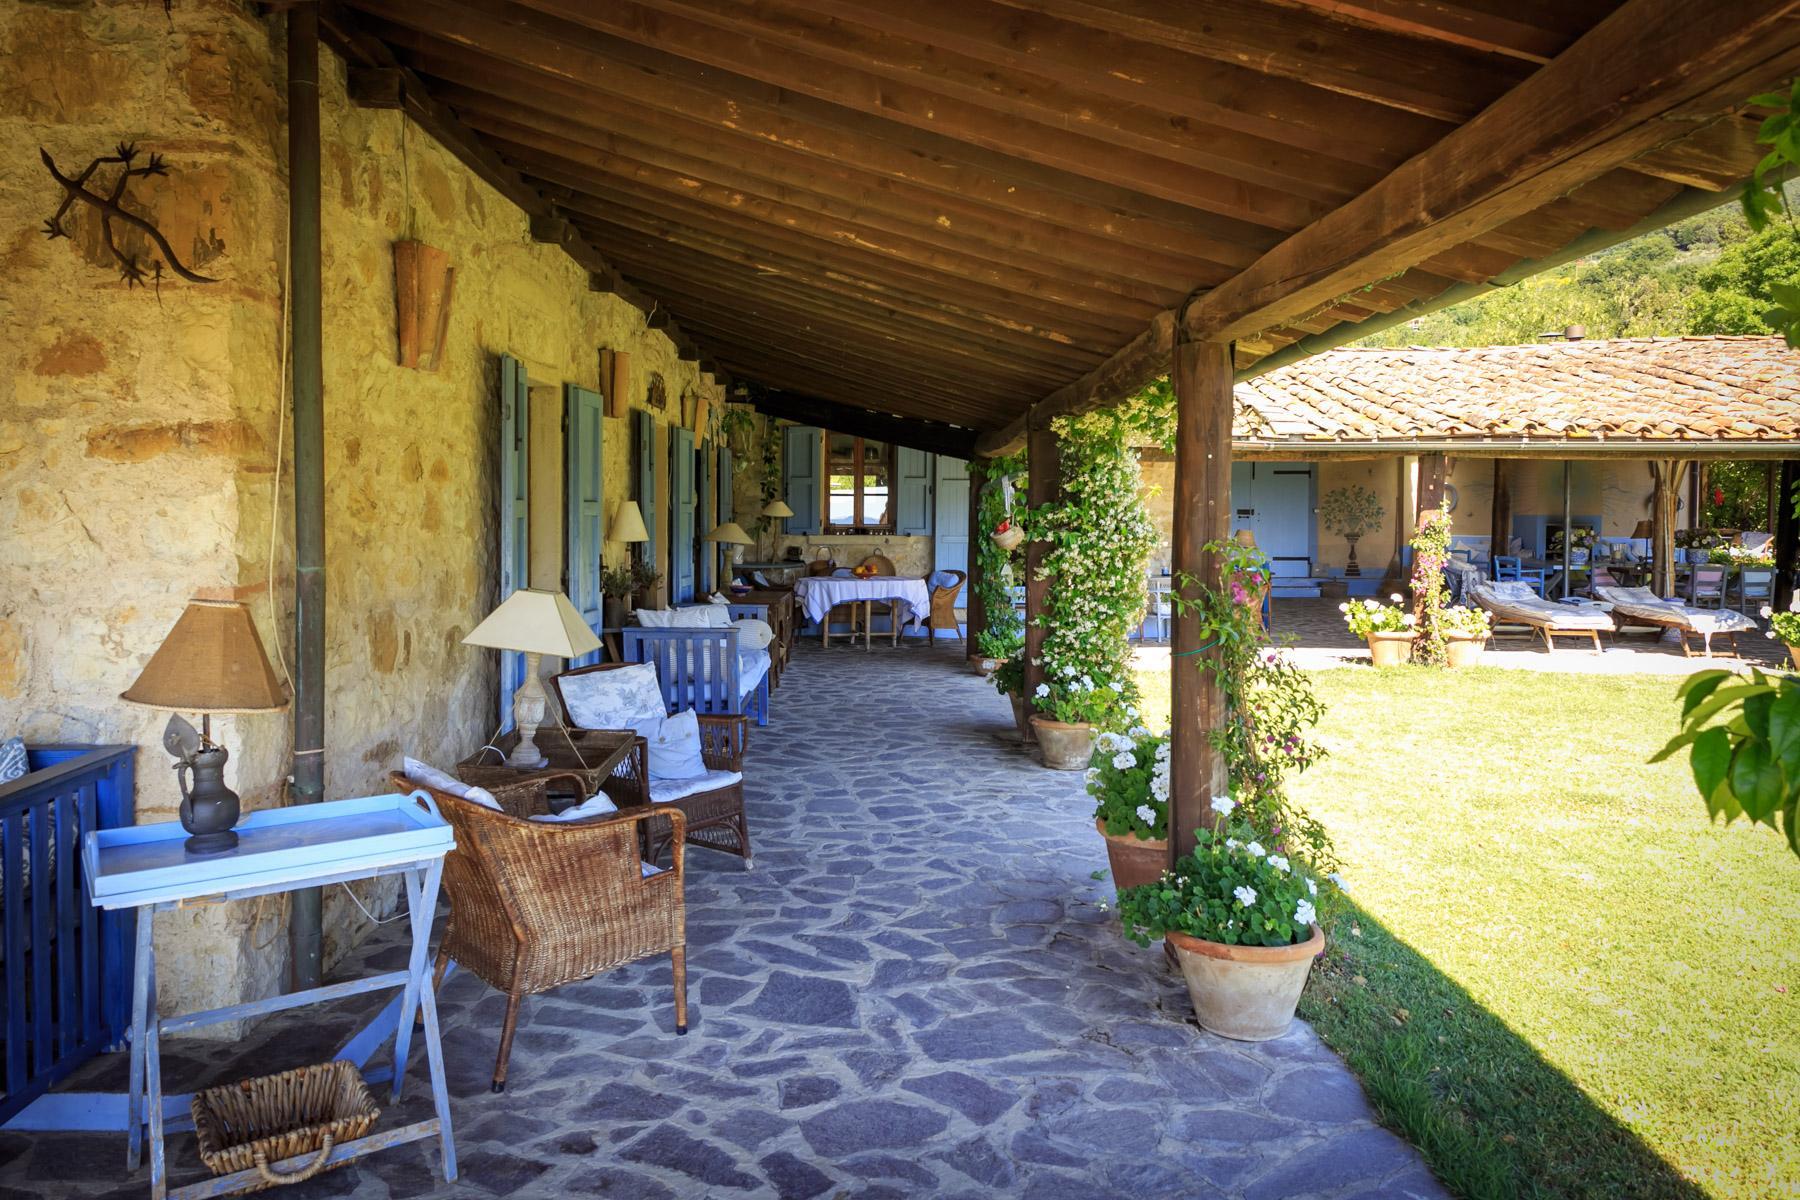 Belle villa toscane avec piscine - 11